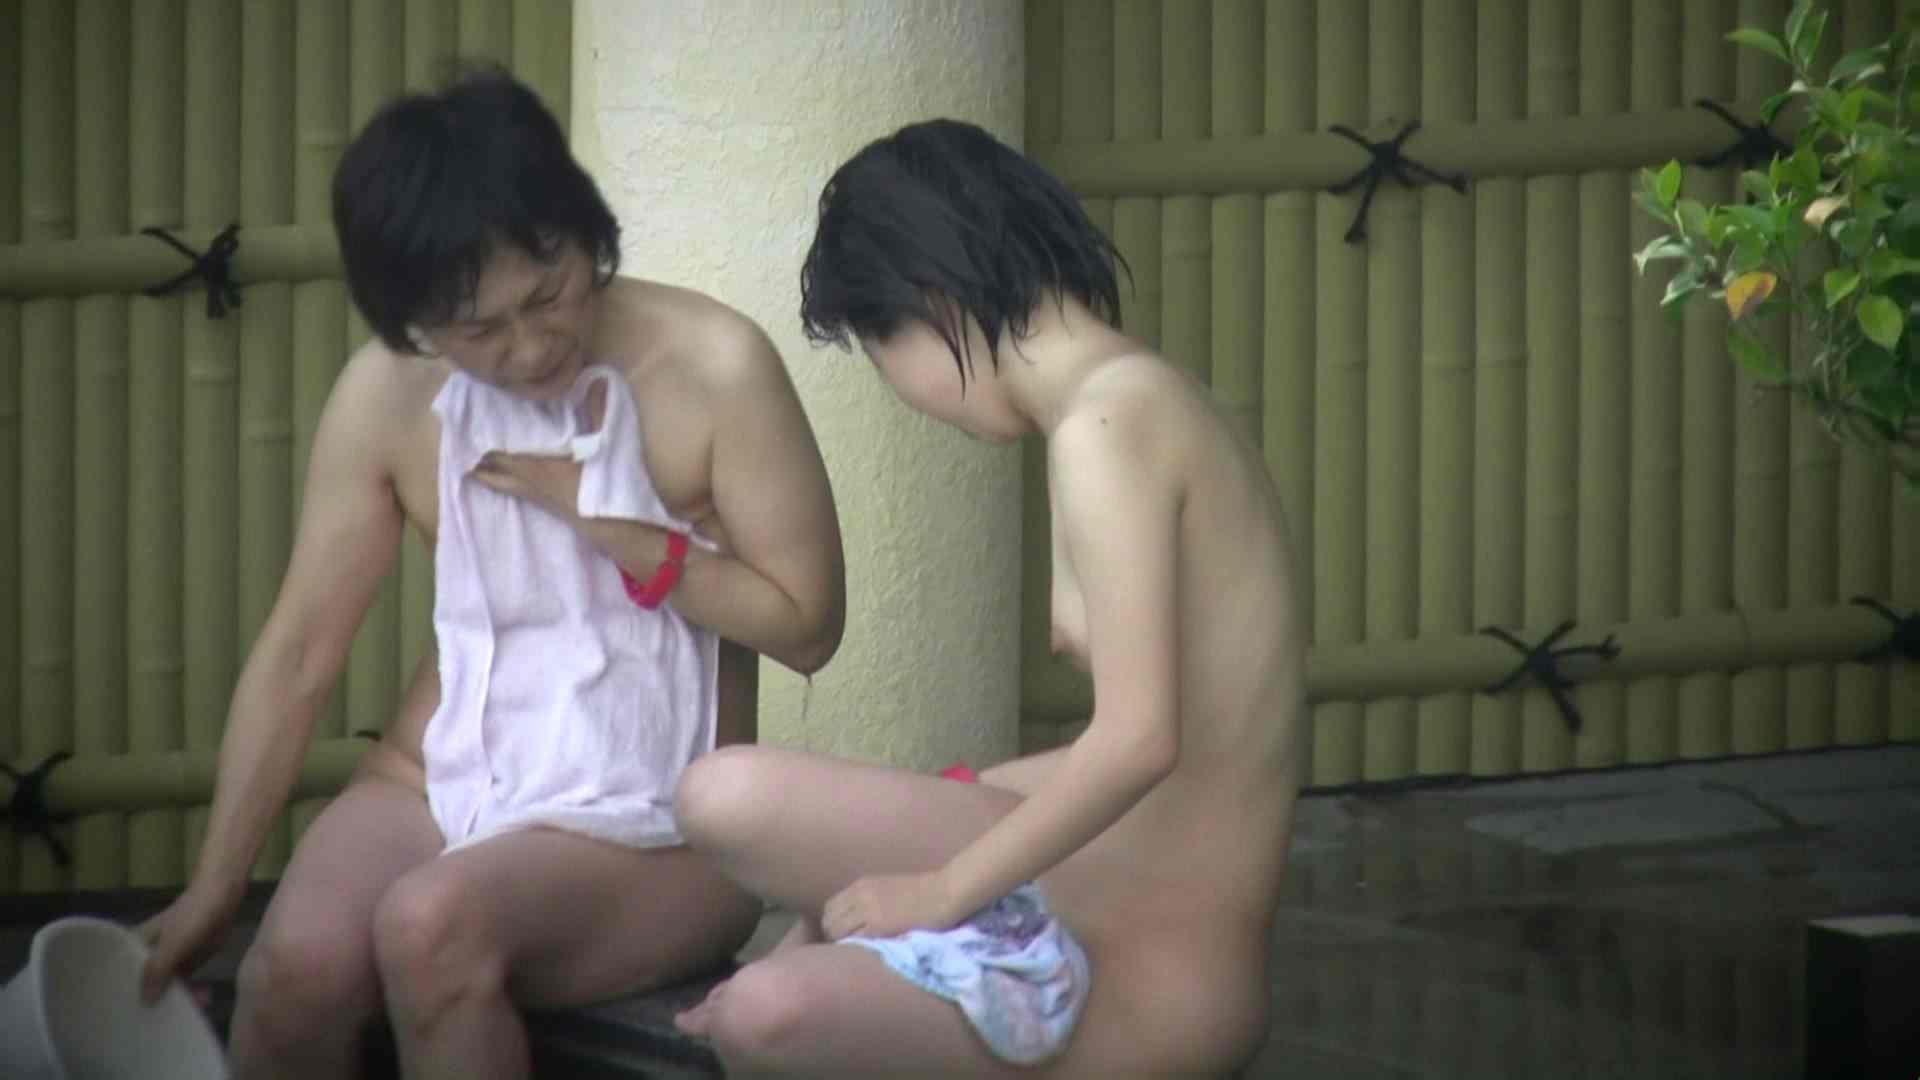 Aquaな露天風呂Vol.06【VIP】 HなOL | 盗撮  86pic 86